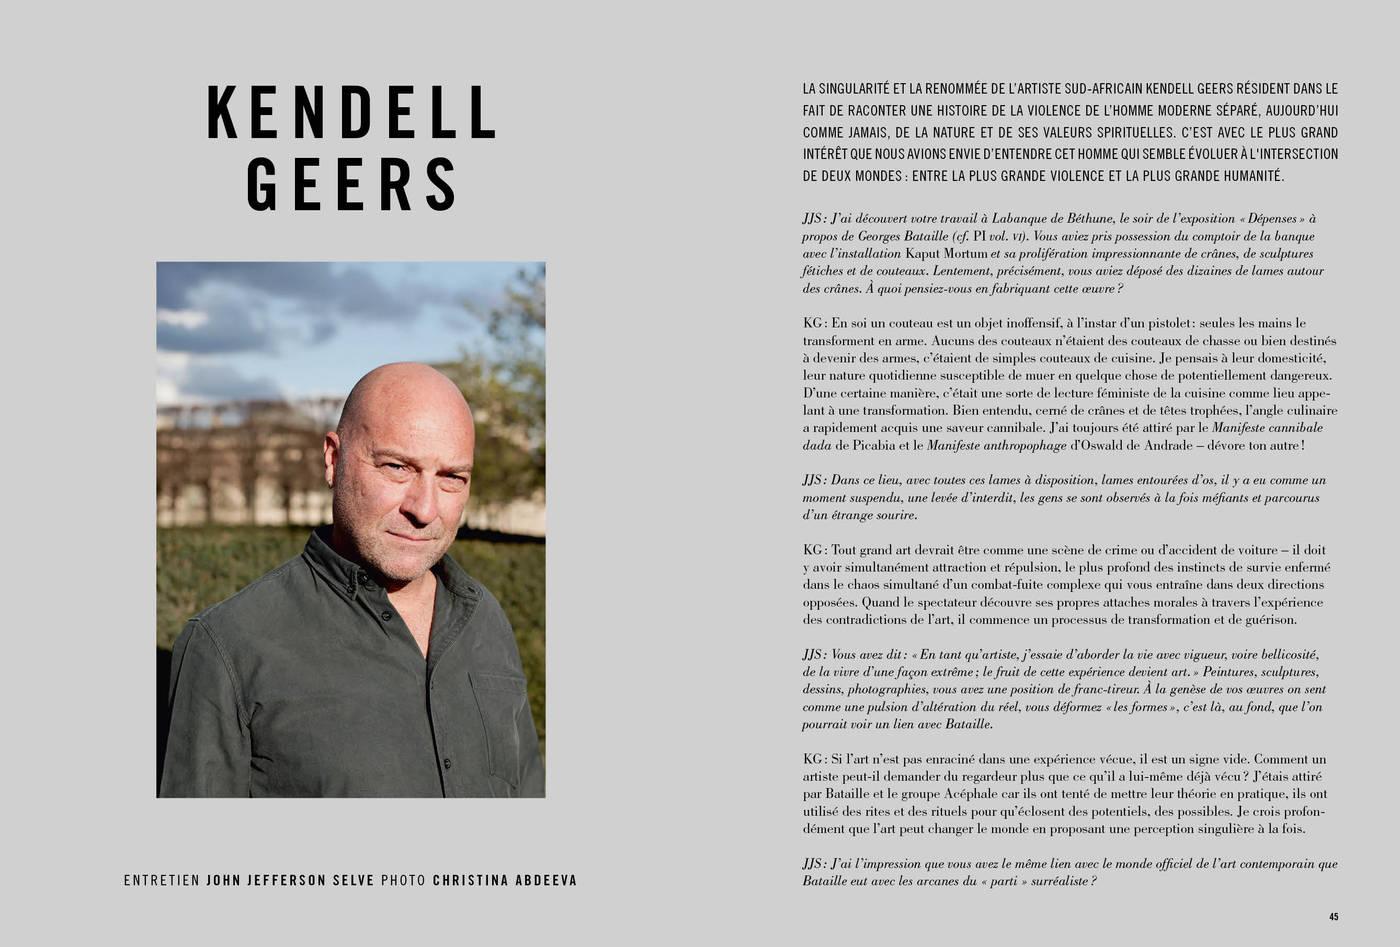 Entretien avec Kendell Geers, photographie de Christina Abdeeva